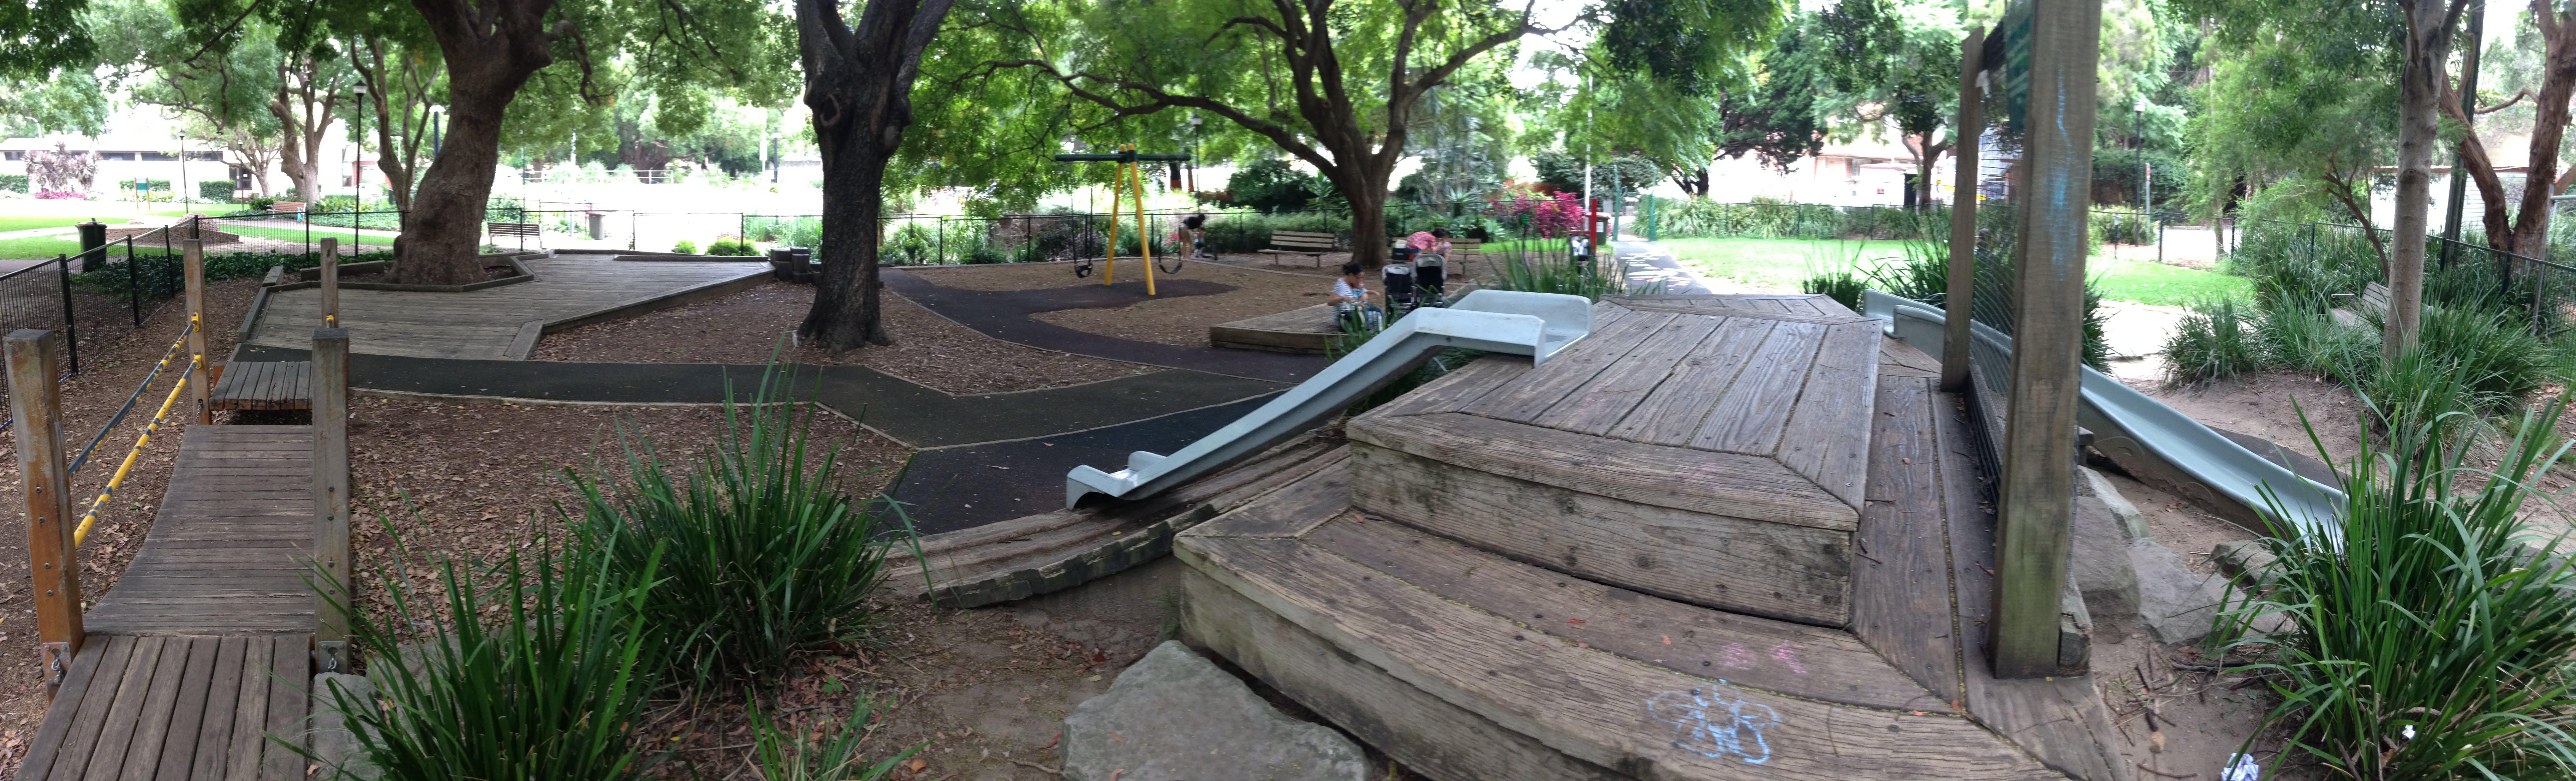 Chatswood Park 2